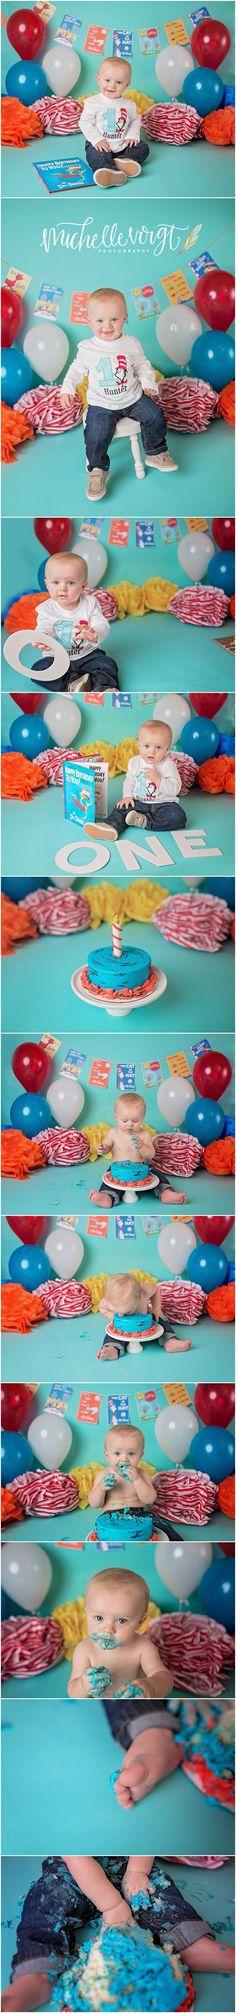 Michelle Voigt Photography  - Cake Smashwww.mvoigtphotography.com Dr. Seuss Cake…